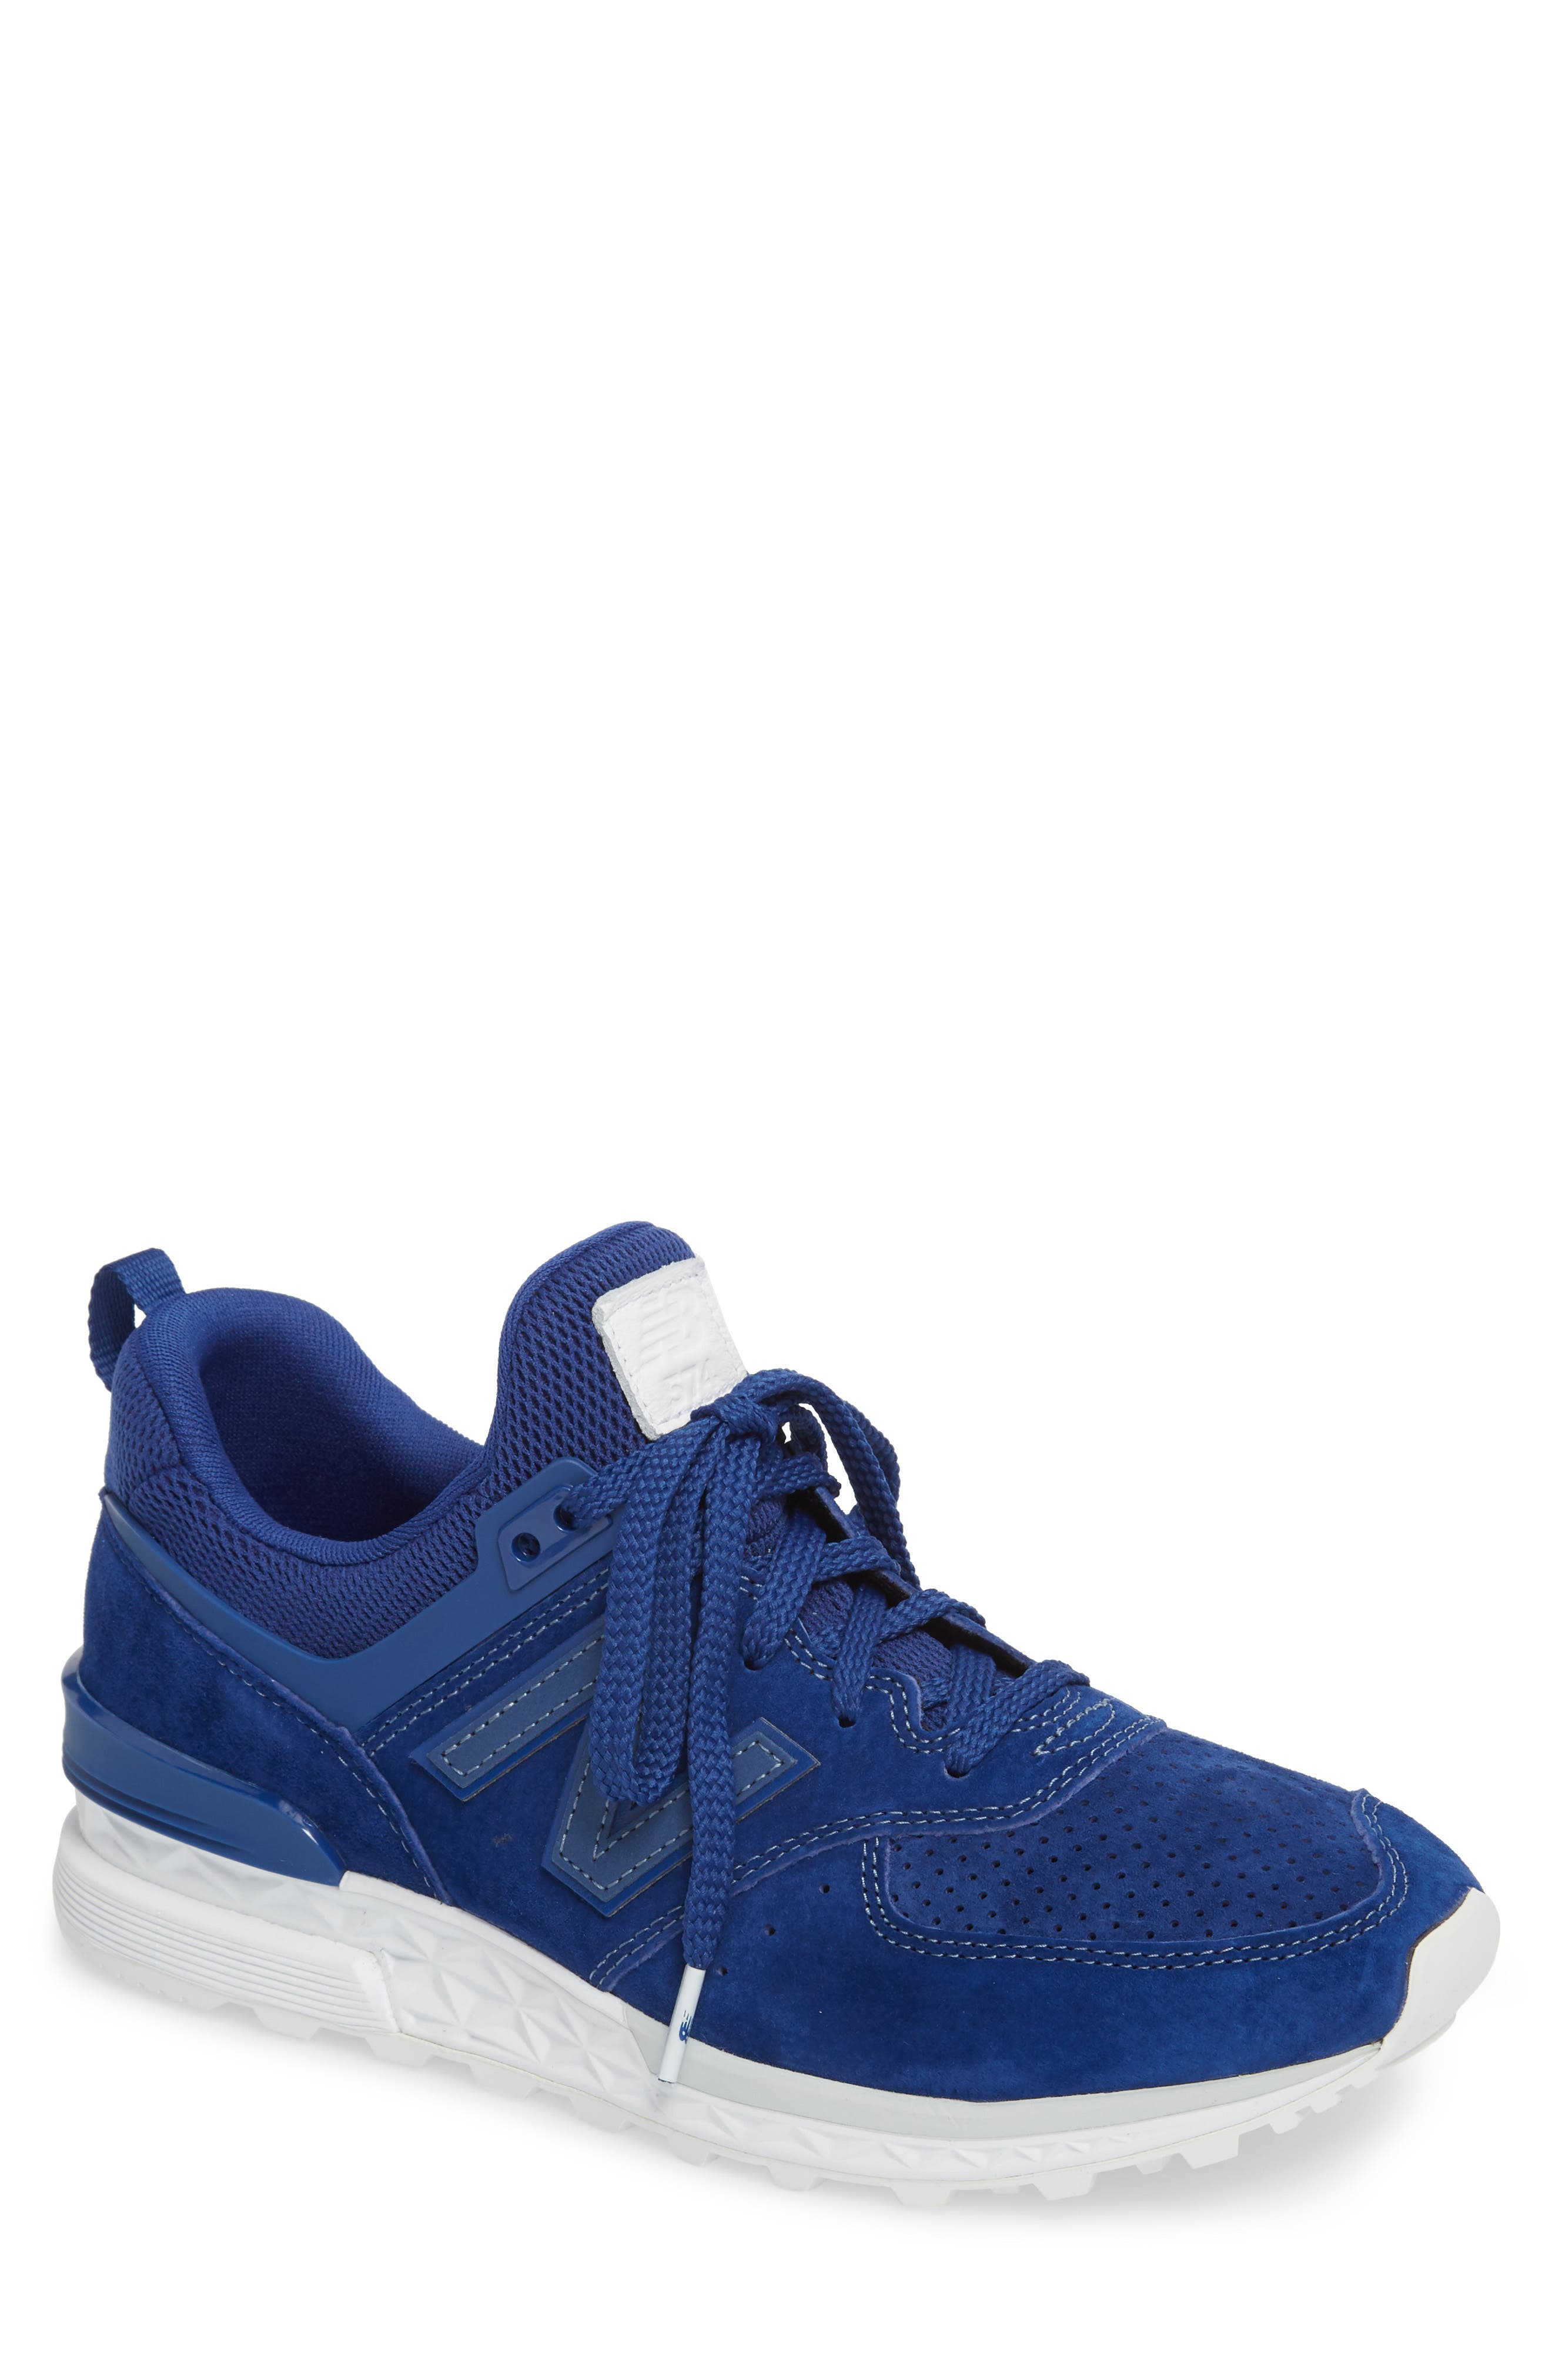 574 Sport Sneaker,                             Main thumbnail 1, color,                             Atlantic